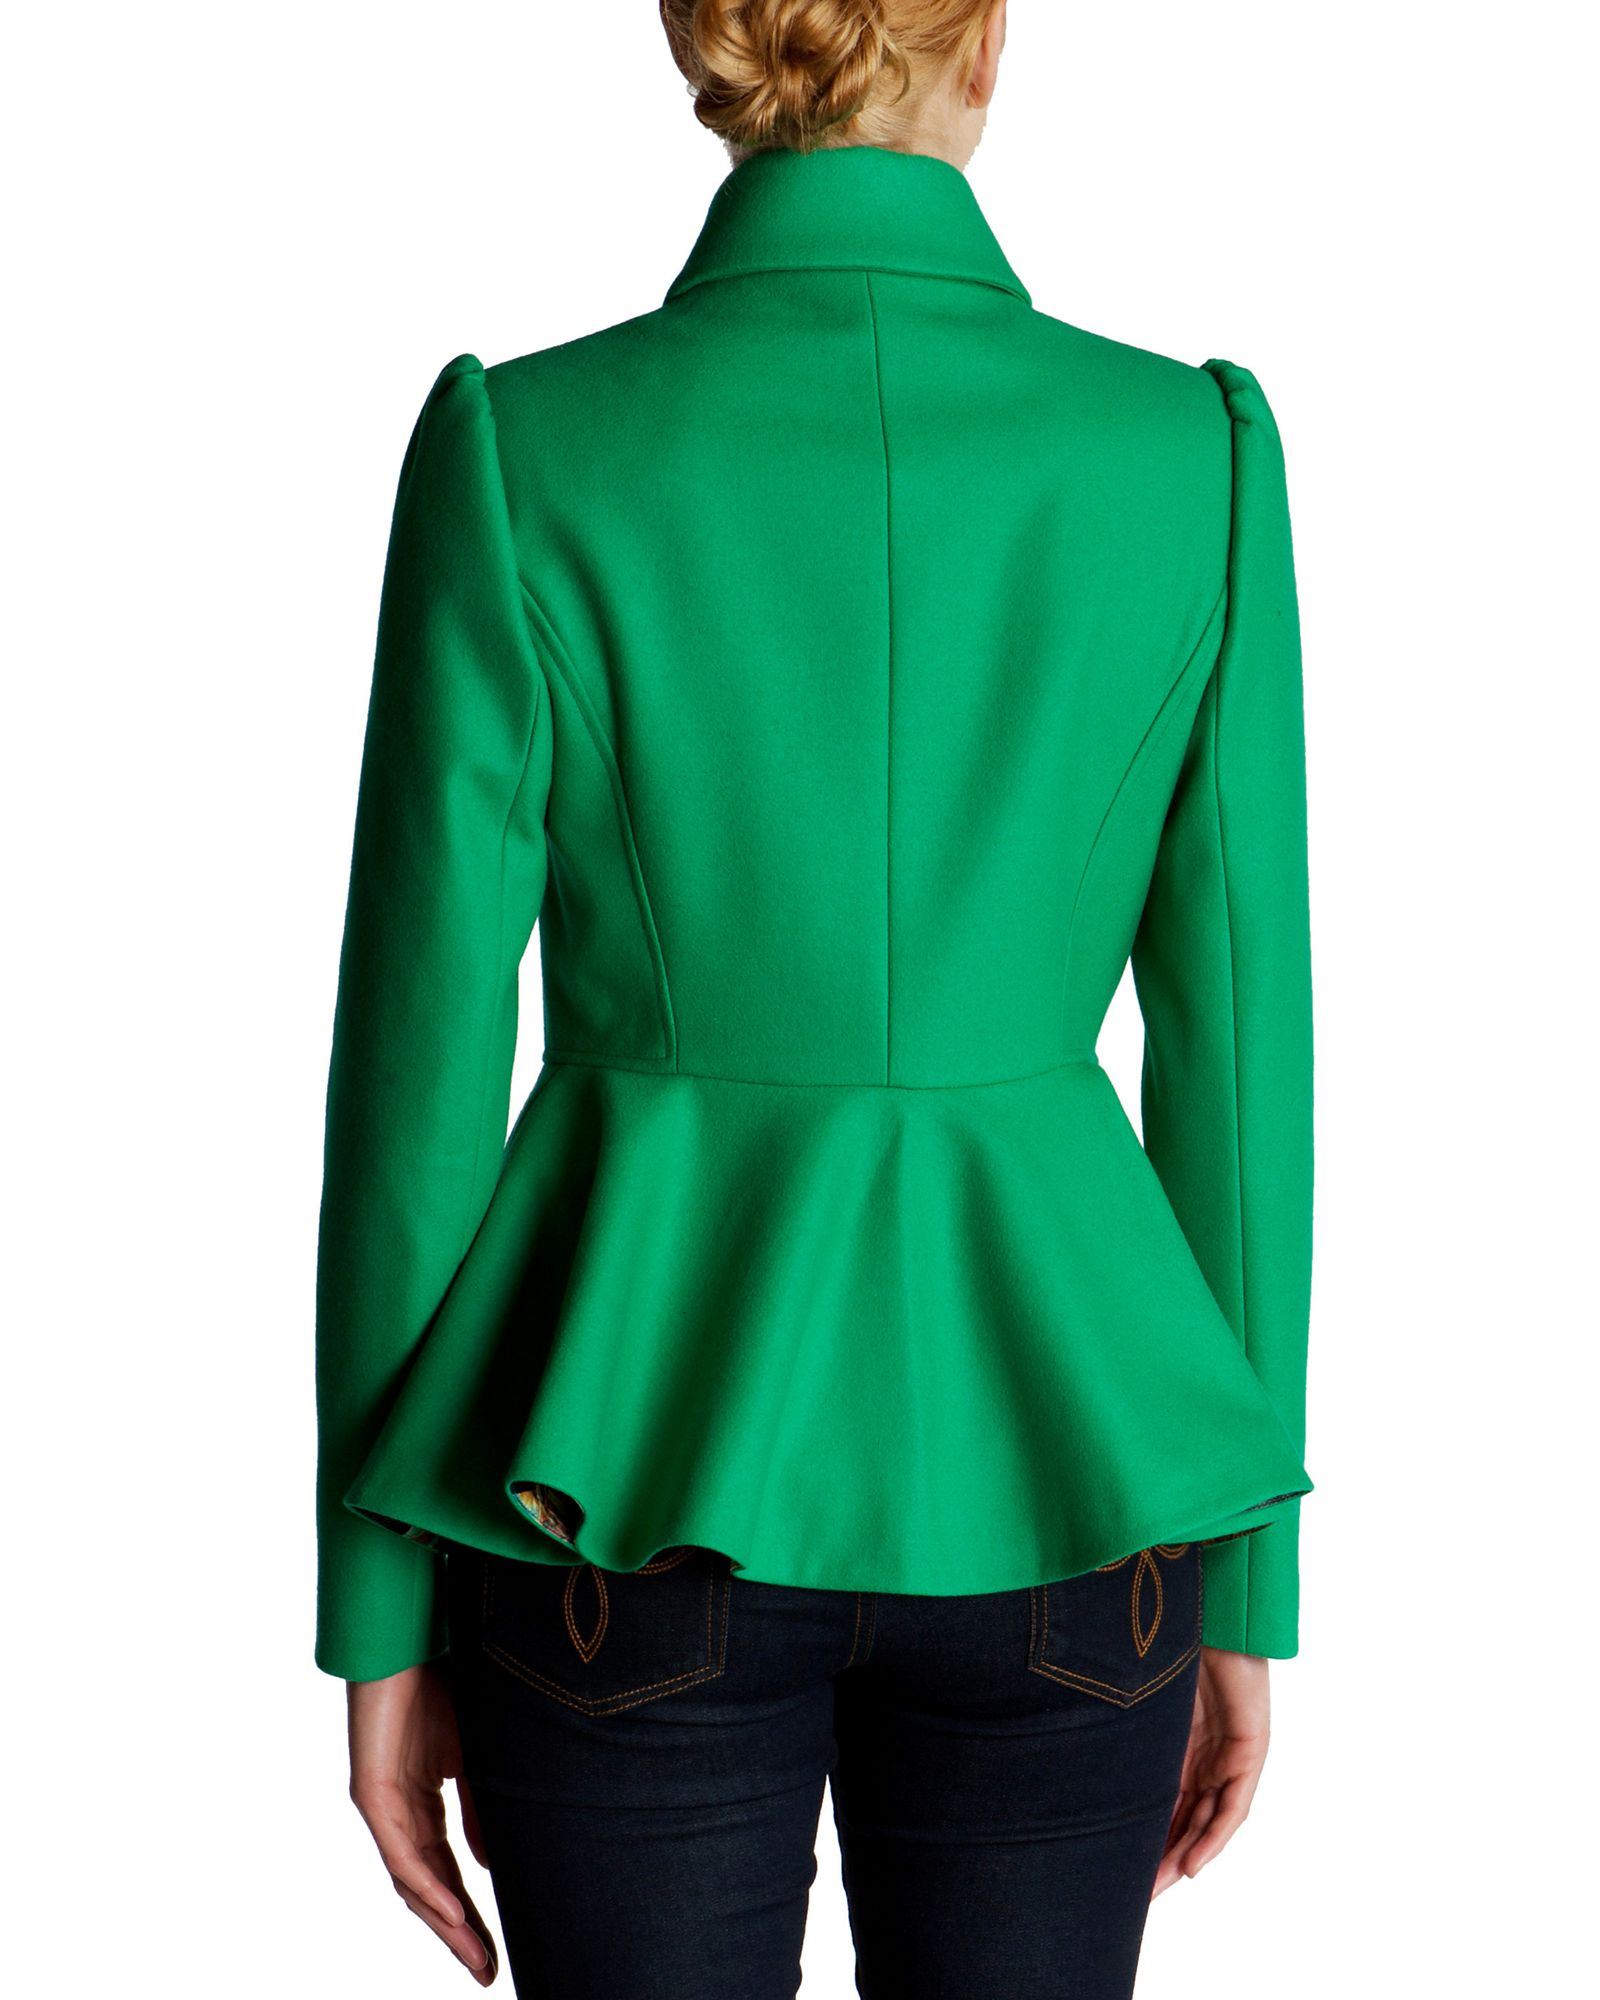 Ted baker Sollel Short Peplum Coat in Green | Lyst